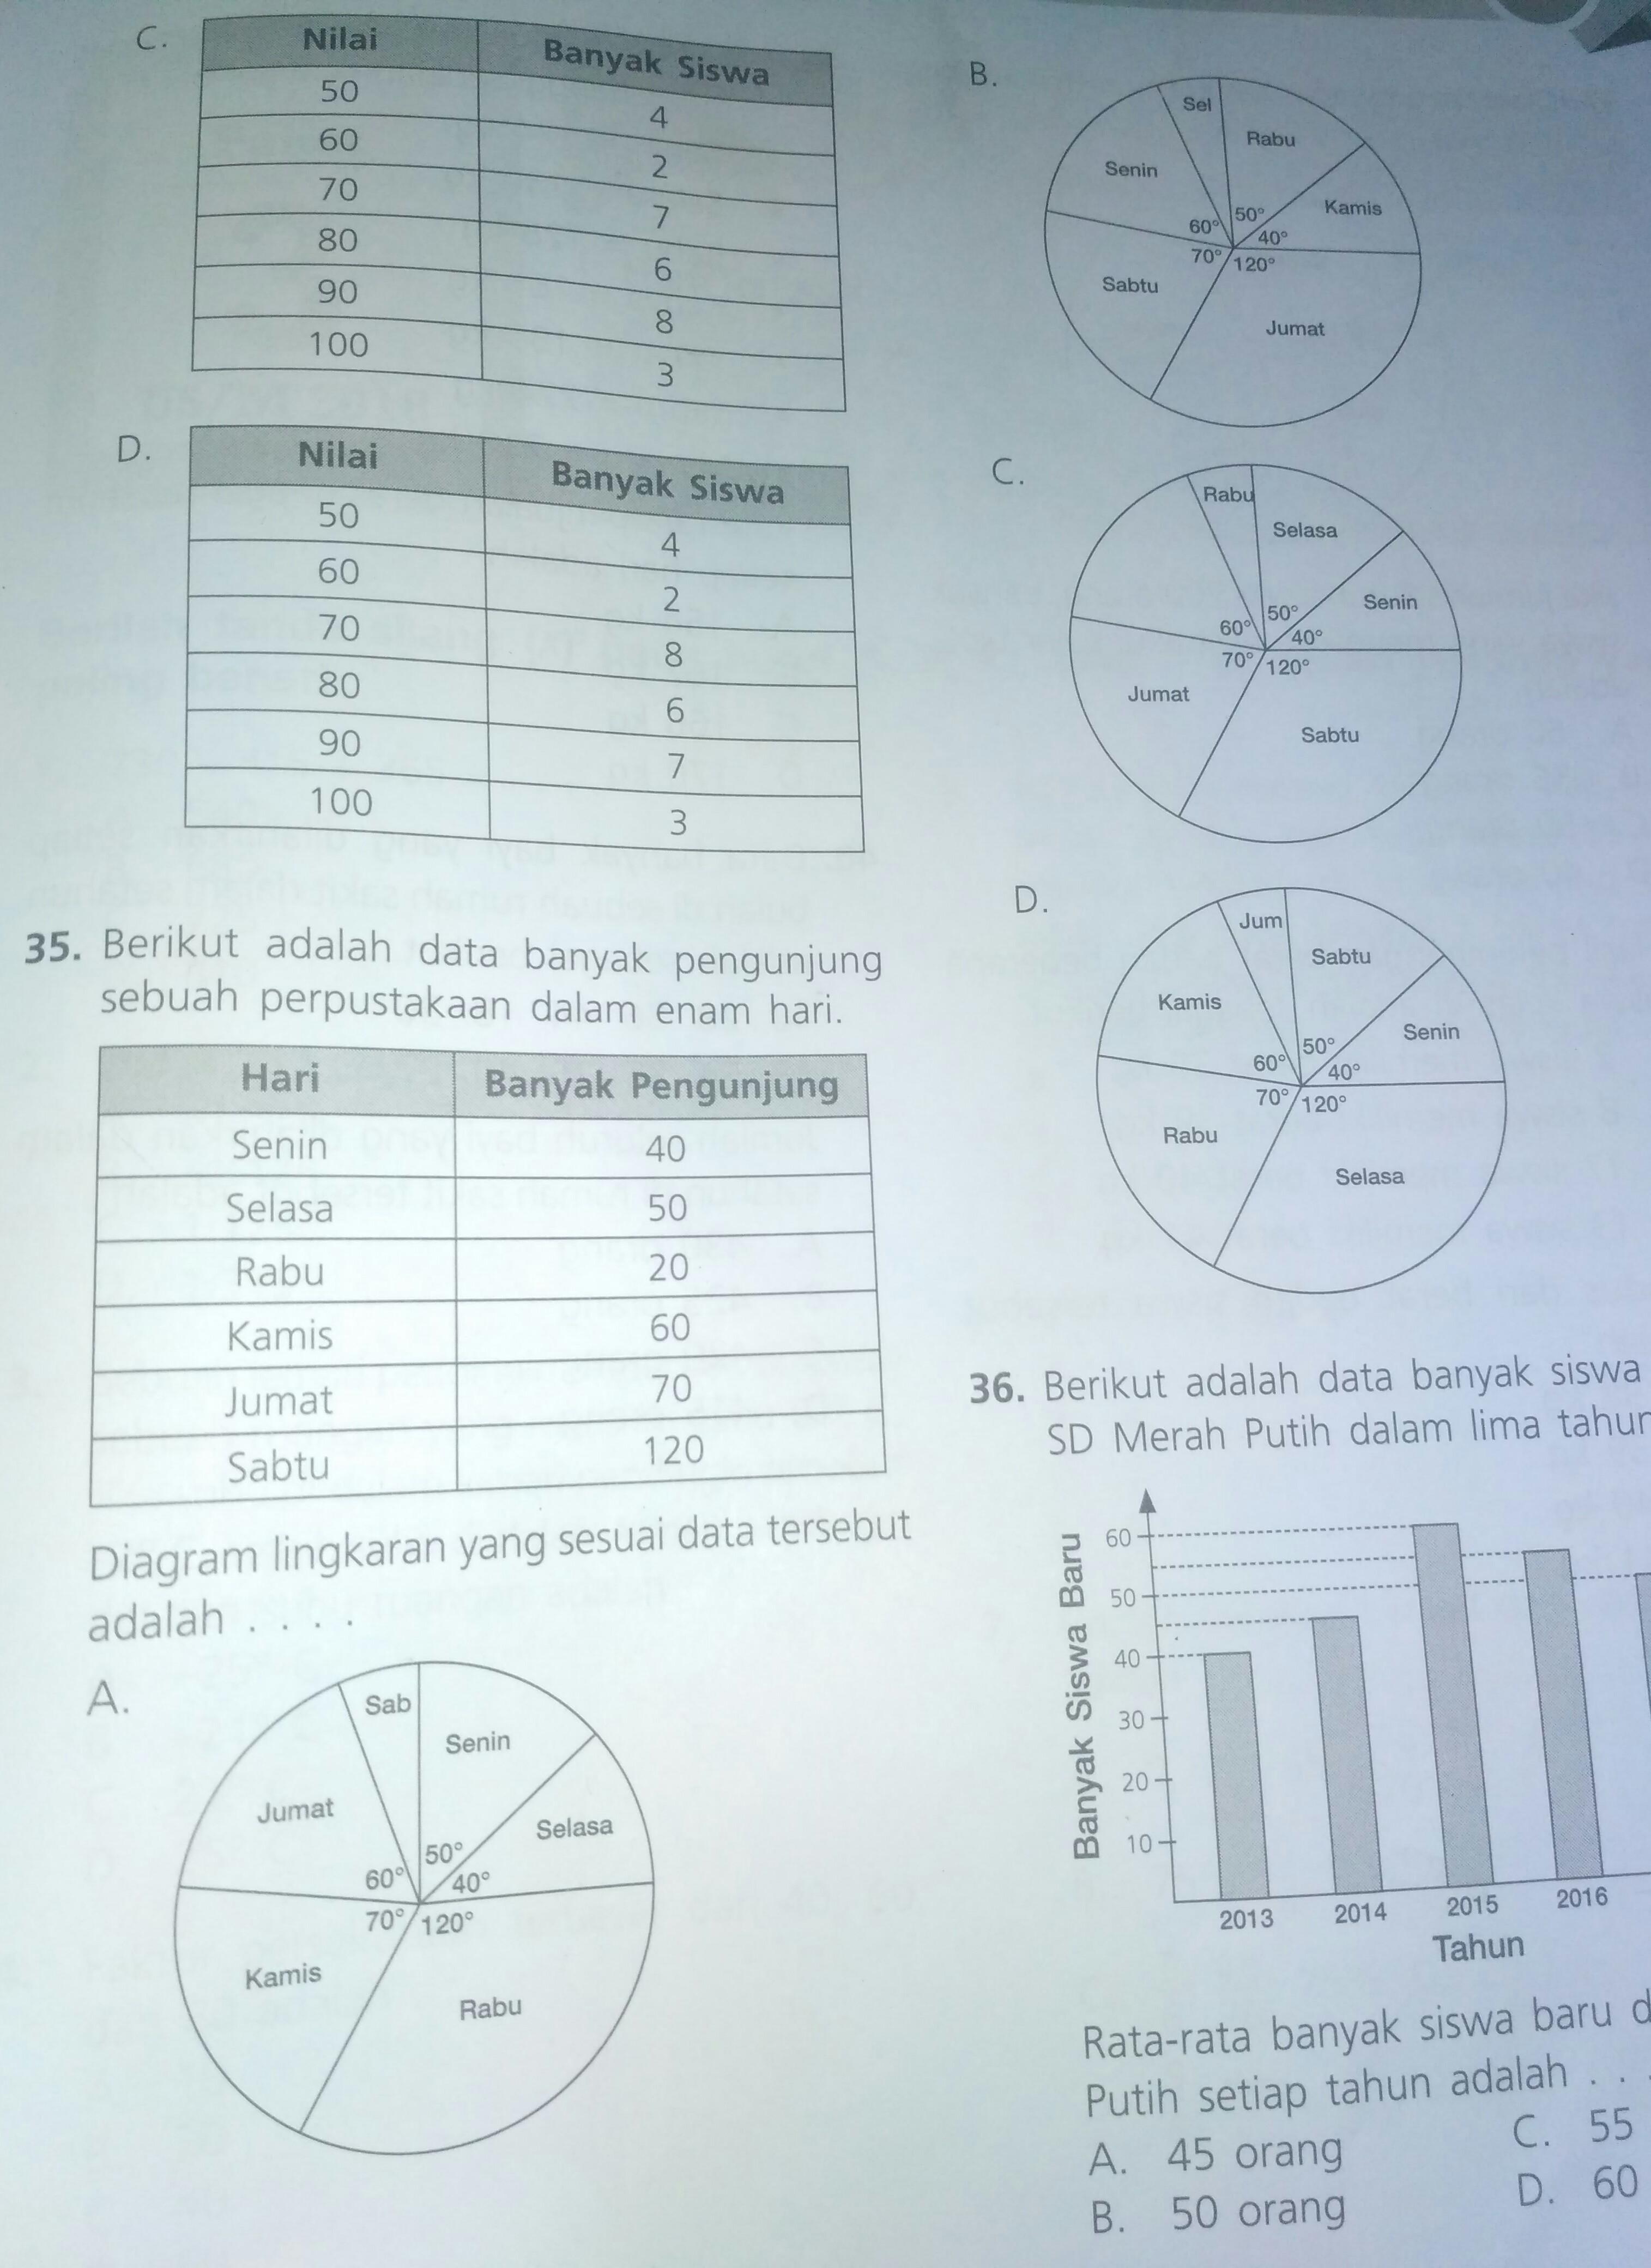 Diagram lingkaran yang sesuai data tersebut adalahno35 brainly diagram lingkaran yang sesuai data tersebut adalahno35 ccuart Gallery